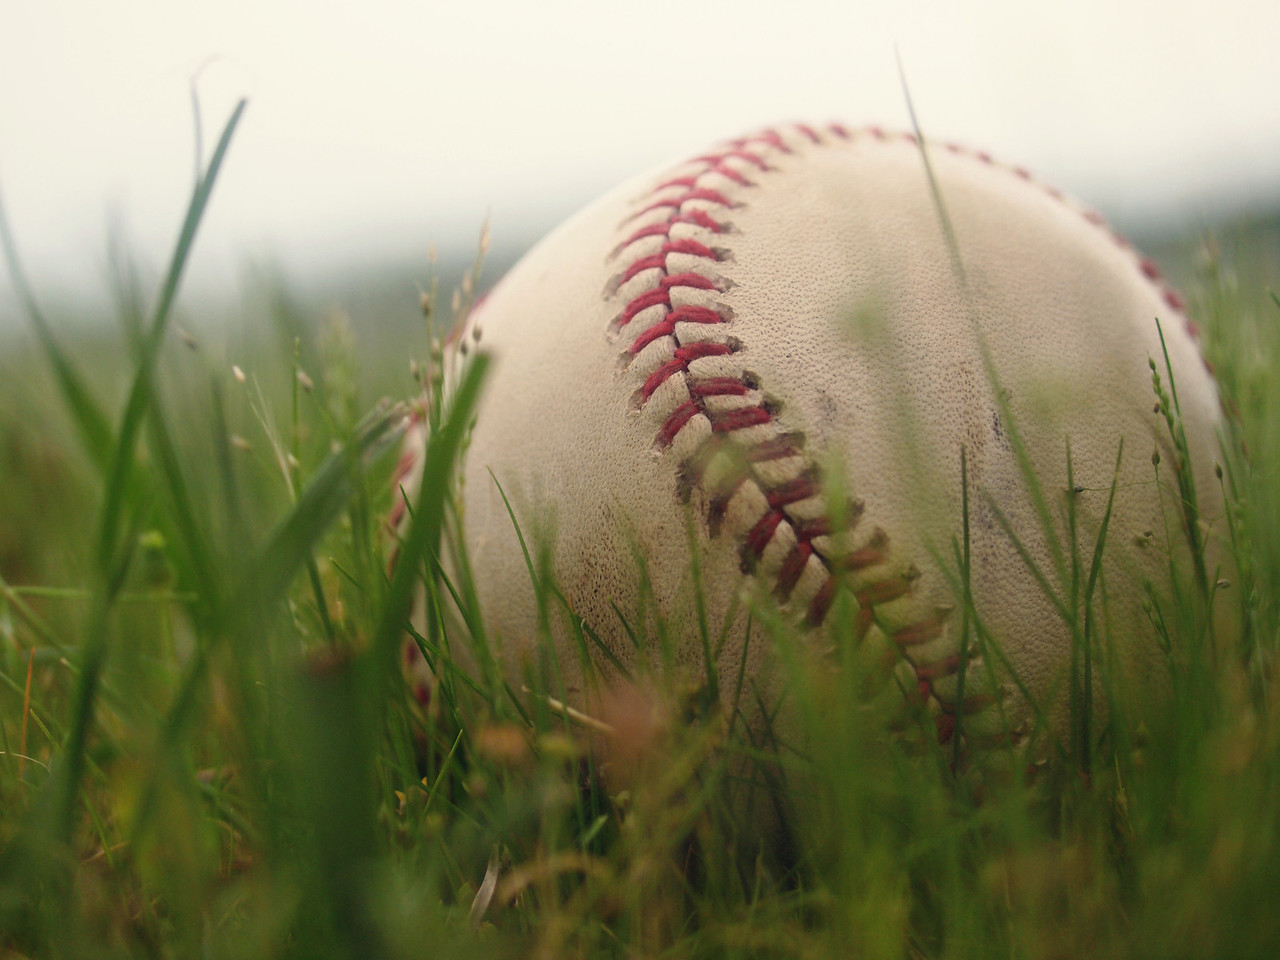 Macro Baseball - This baseball was actually caught by Troy at a Texas Rangers baseball game.  Order Code: A23